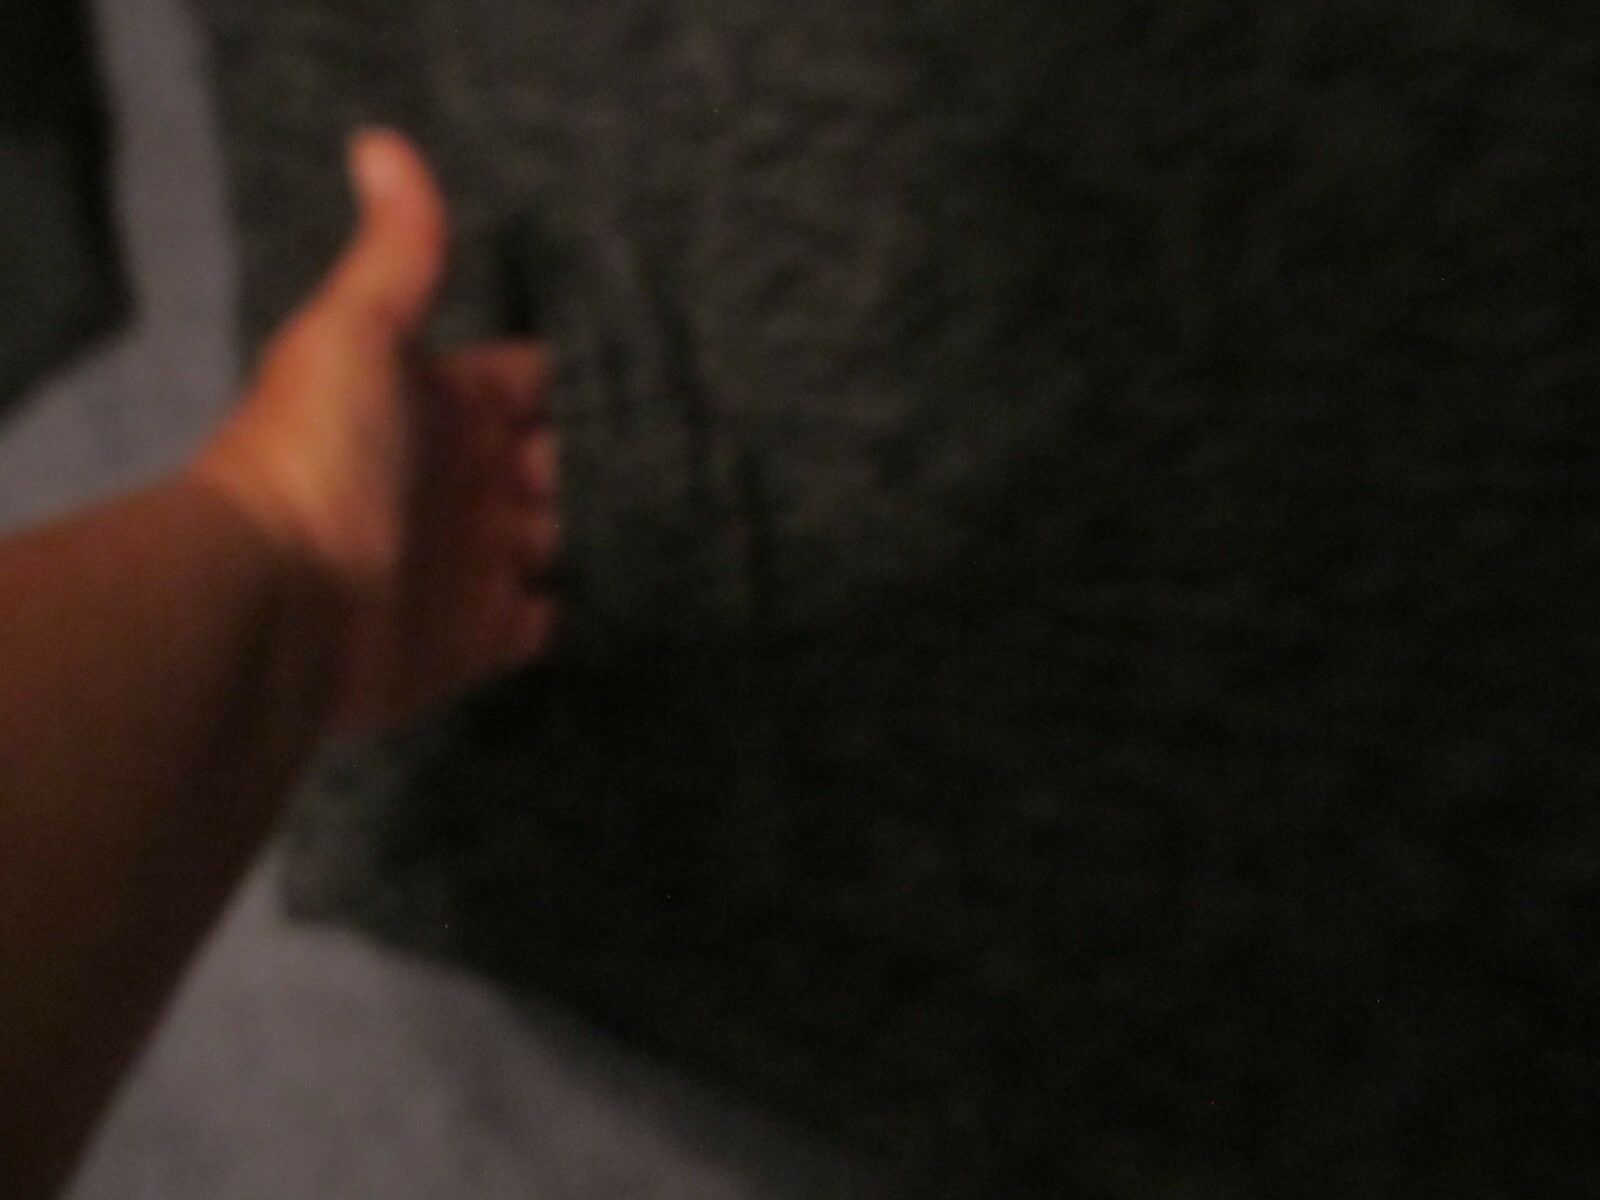 NWT VICTORIA'S SECRET PINK TUNIC TUNIC TUNIC HALF ZIP LARGE DARK HEATHER GREY e881d4